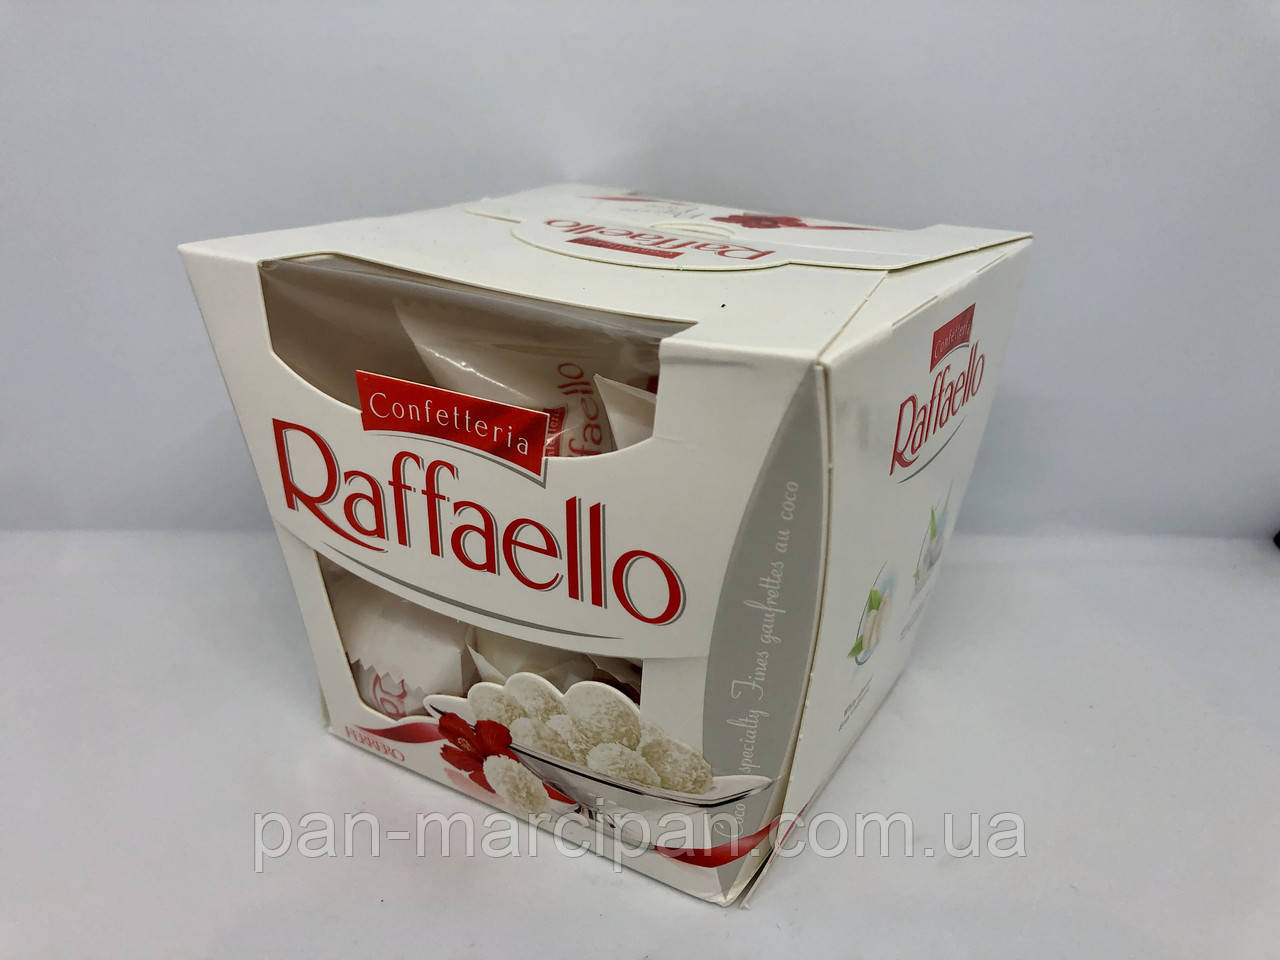 Цукерки Raffaello 150гр (Польща)